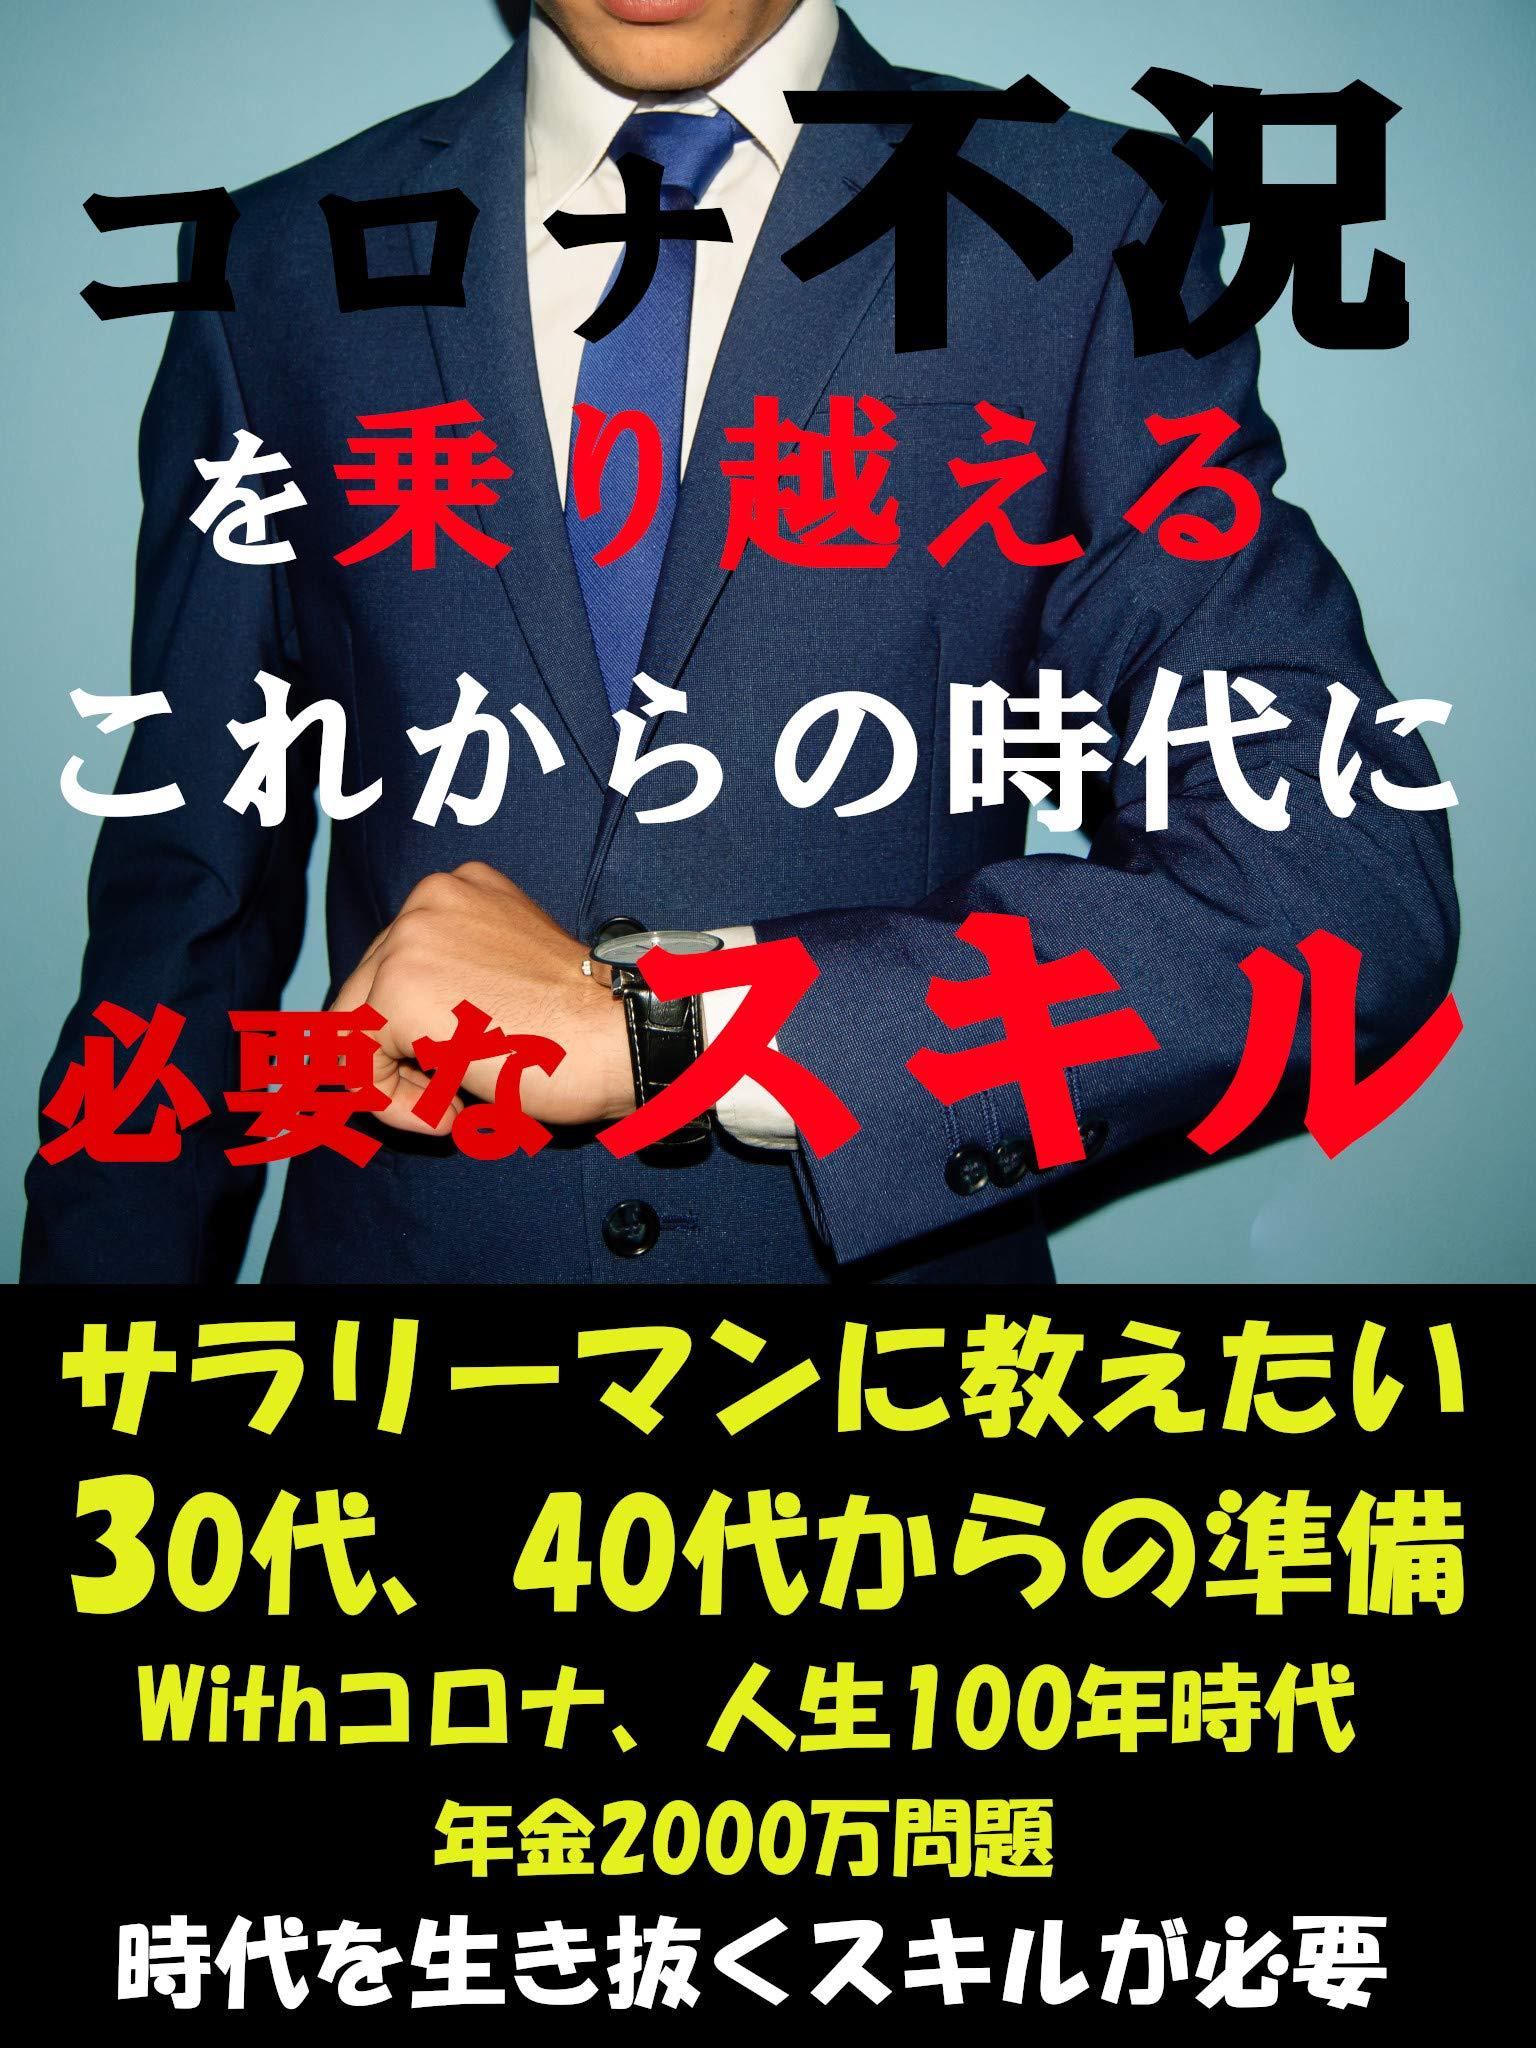 koronafukyouwonorikoerukorekaranojidainihituyounasukill: nisennijyuunennban (utyuusyultupann) (Japanese Edition)